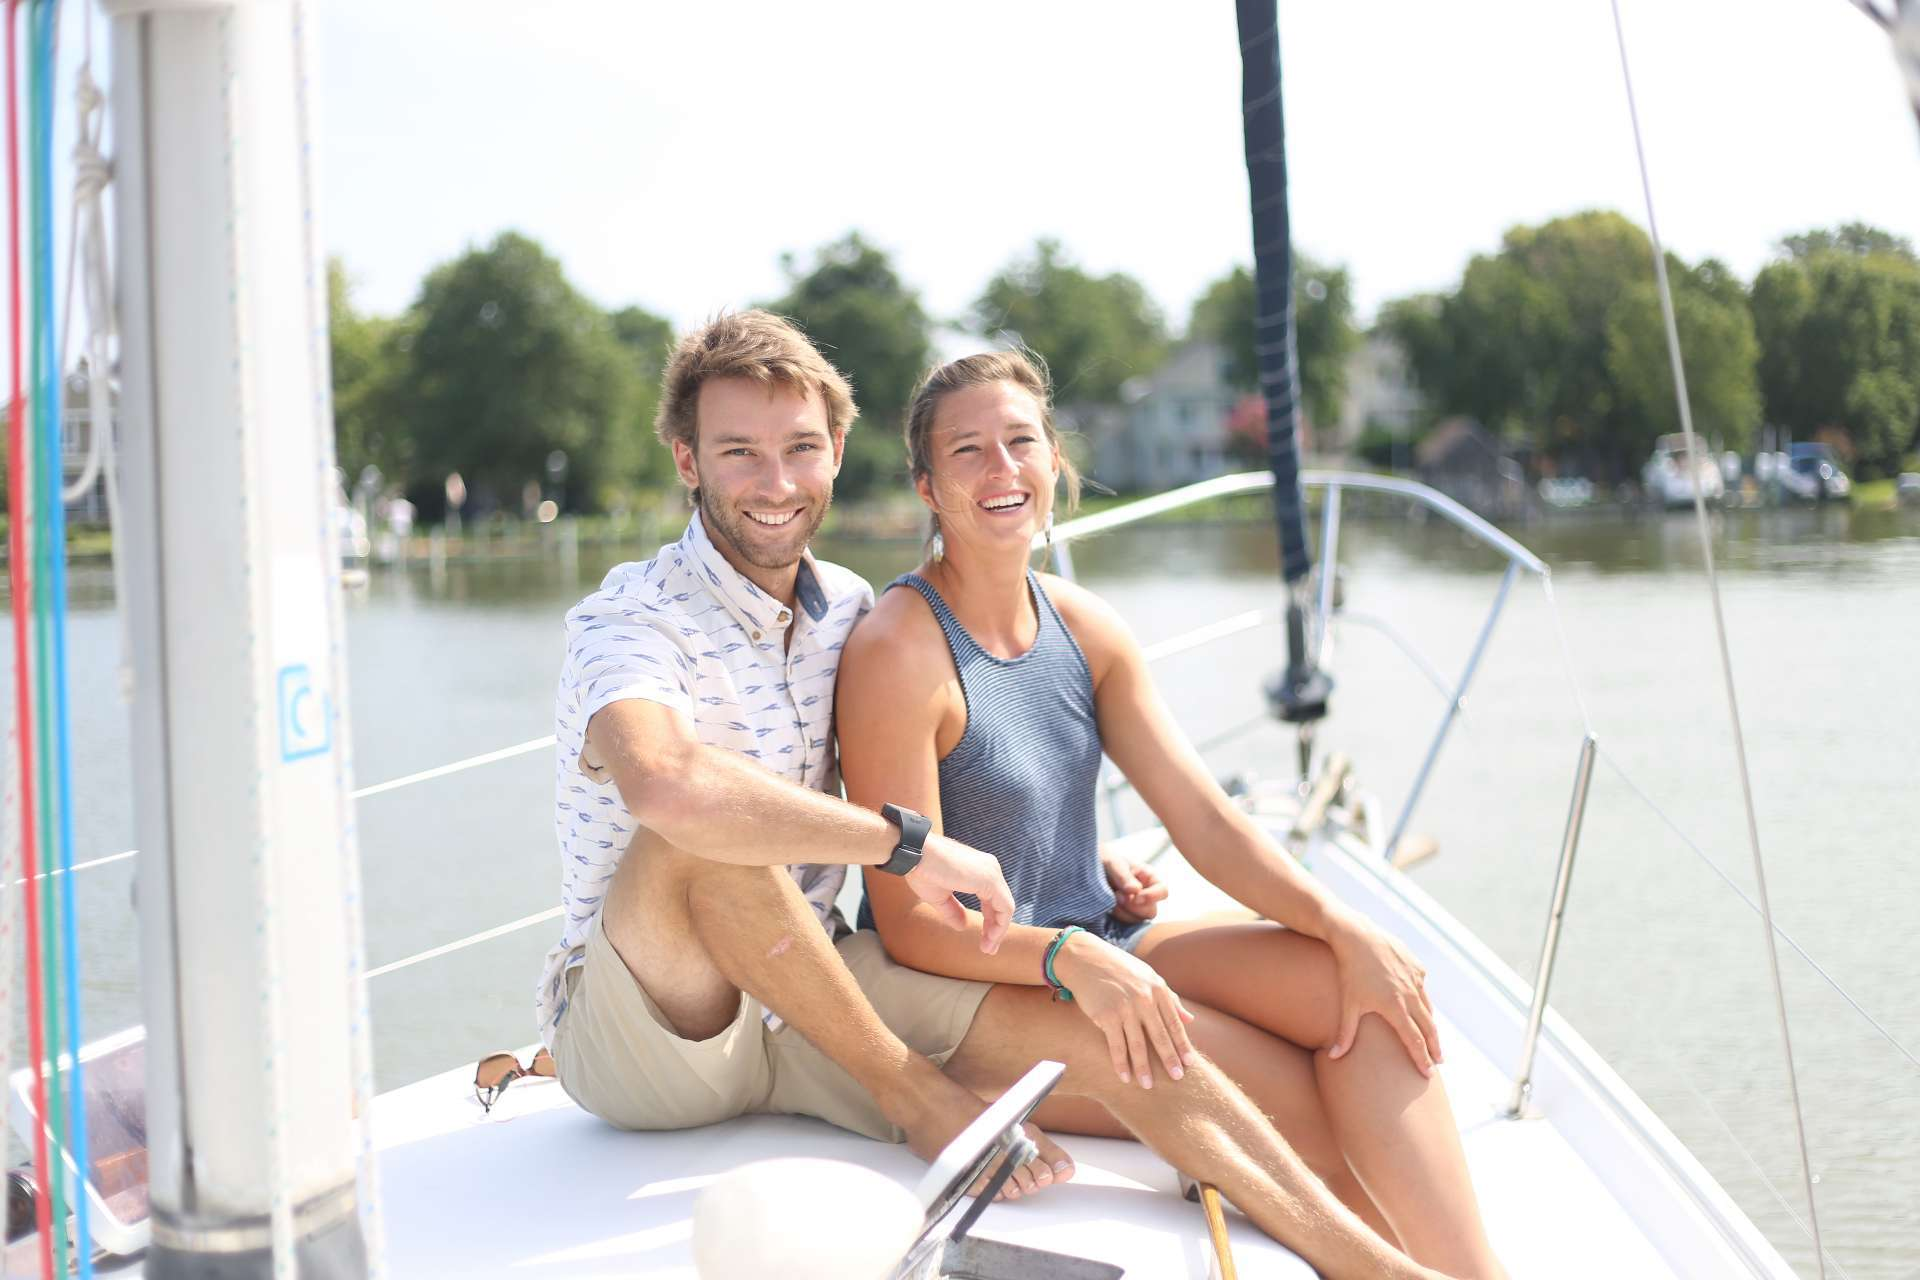 Captain Ryan and Chef/Yoga Instructor Jill